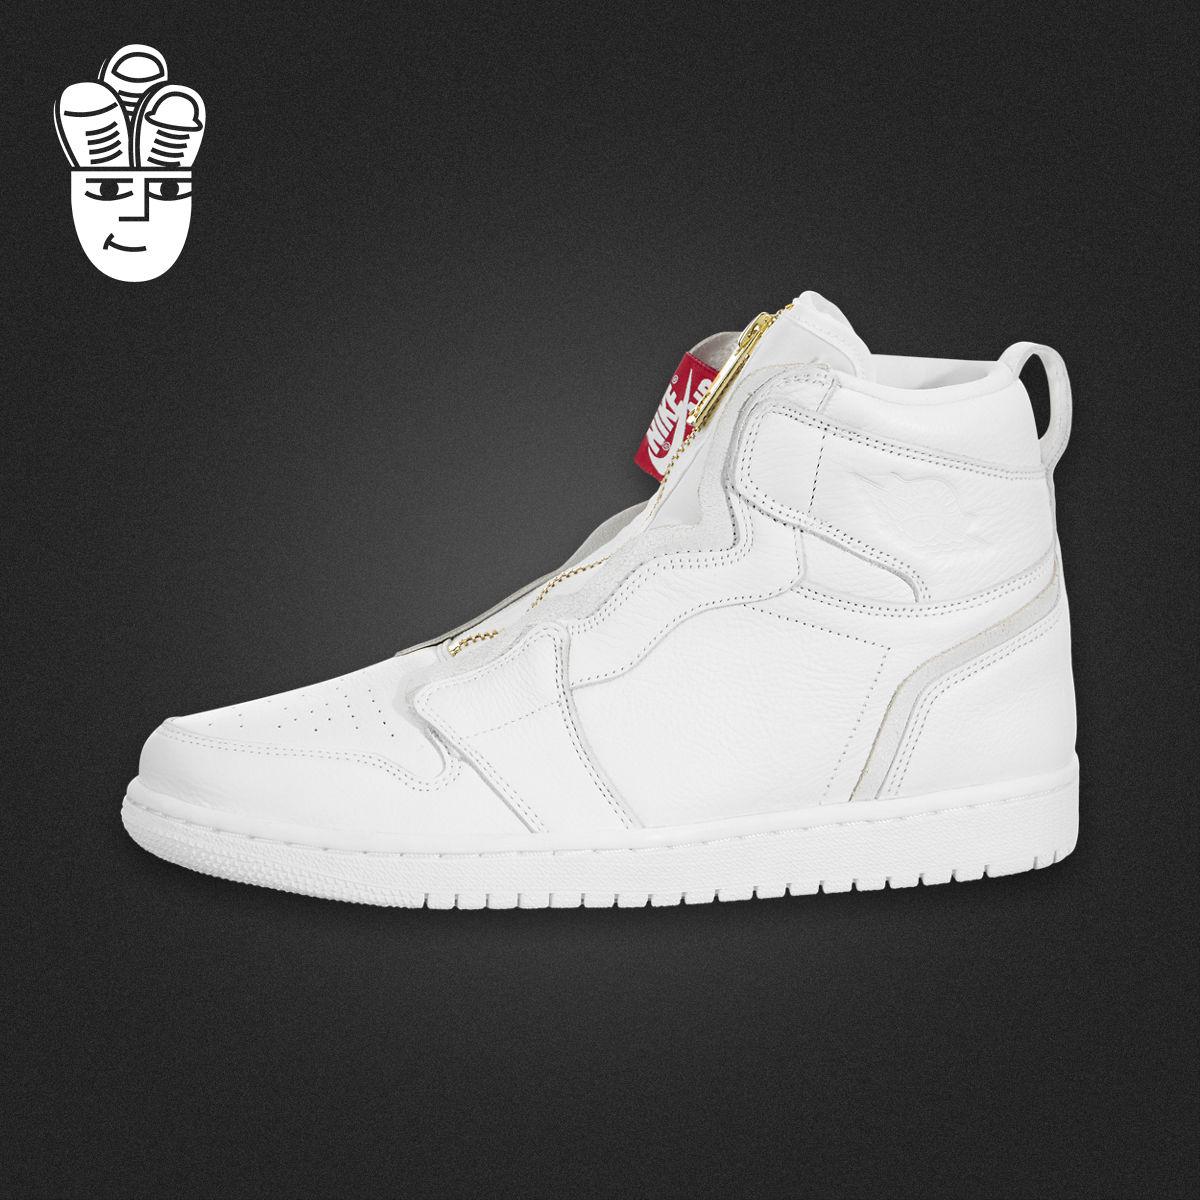 Air Jordan 1 High Zip AJ喬1拉鏈女鞋 高幫運動休閑鞋 籃球鞋